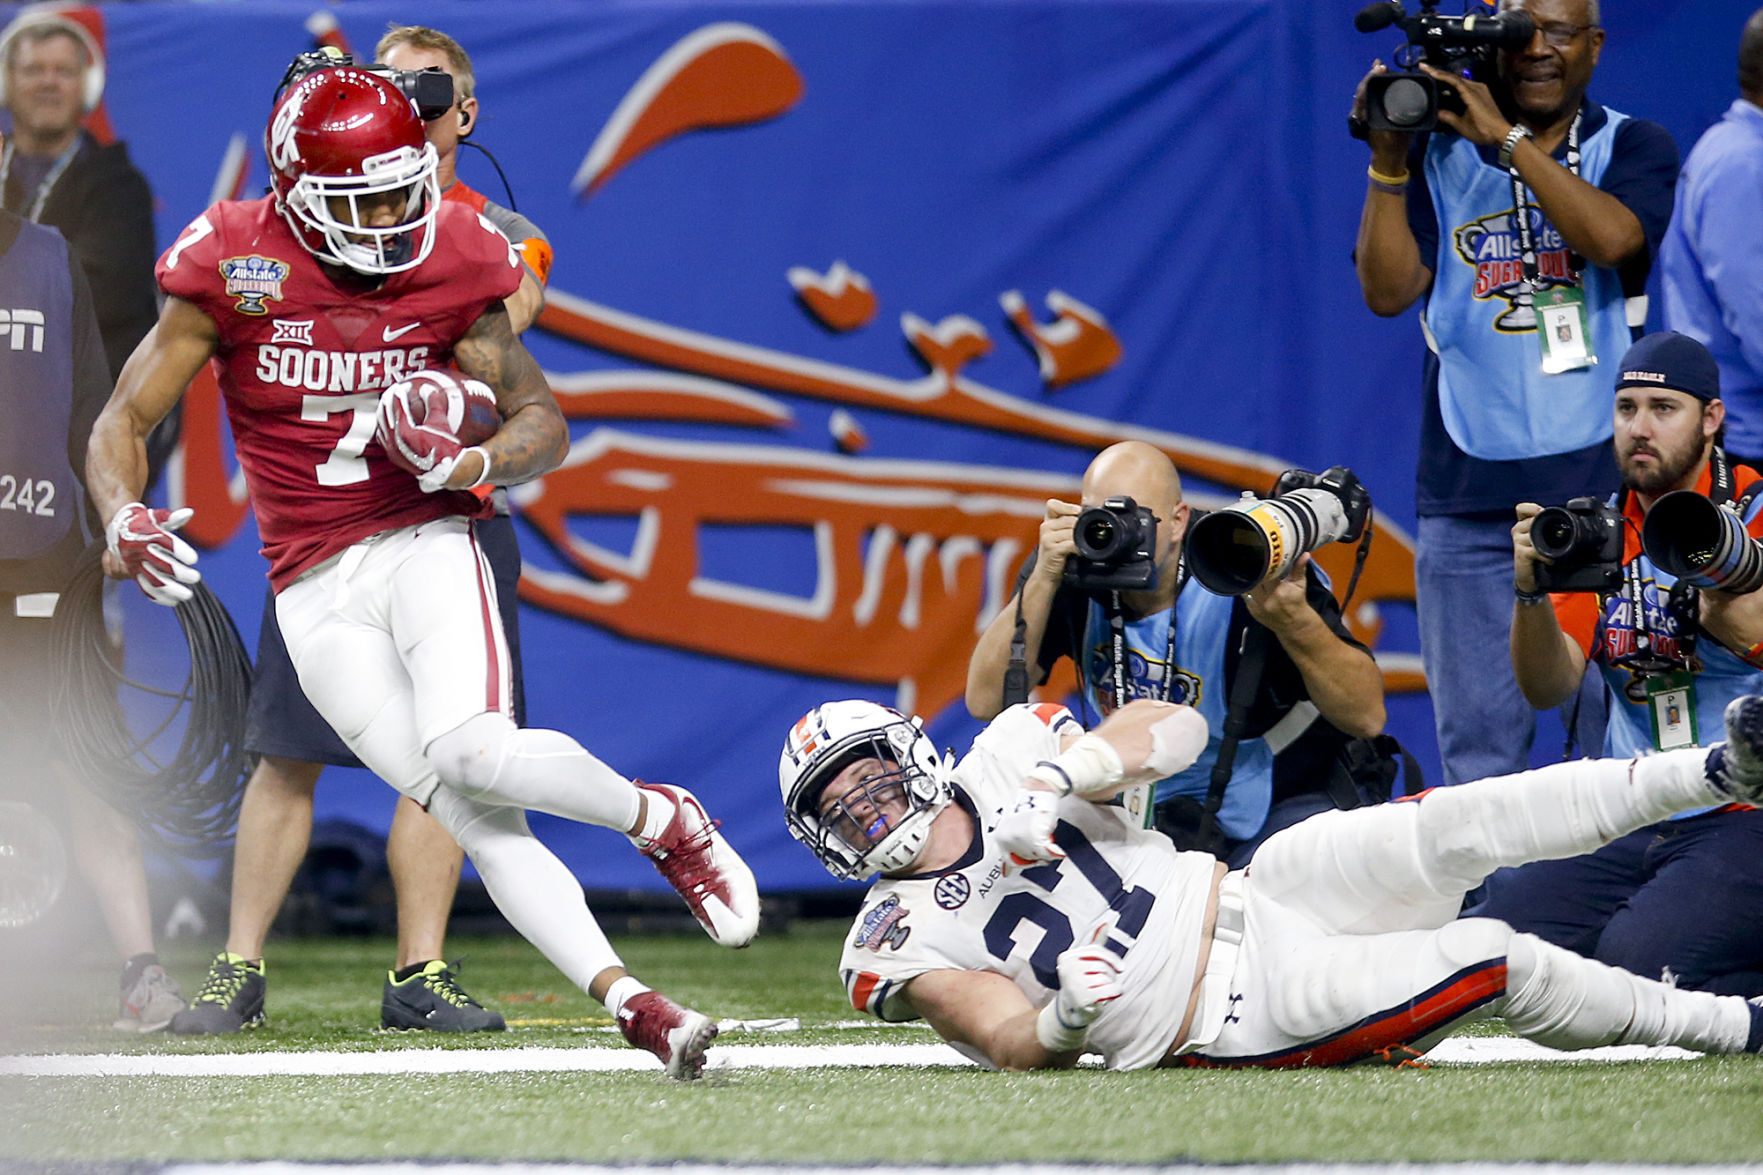 OU Sports Extra - Oklahoma football: A look at defensive backs